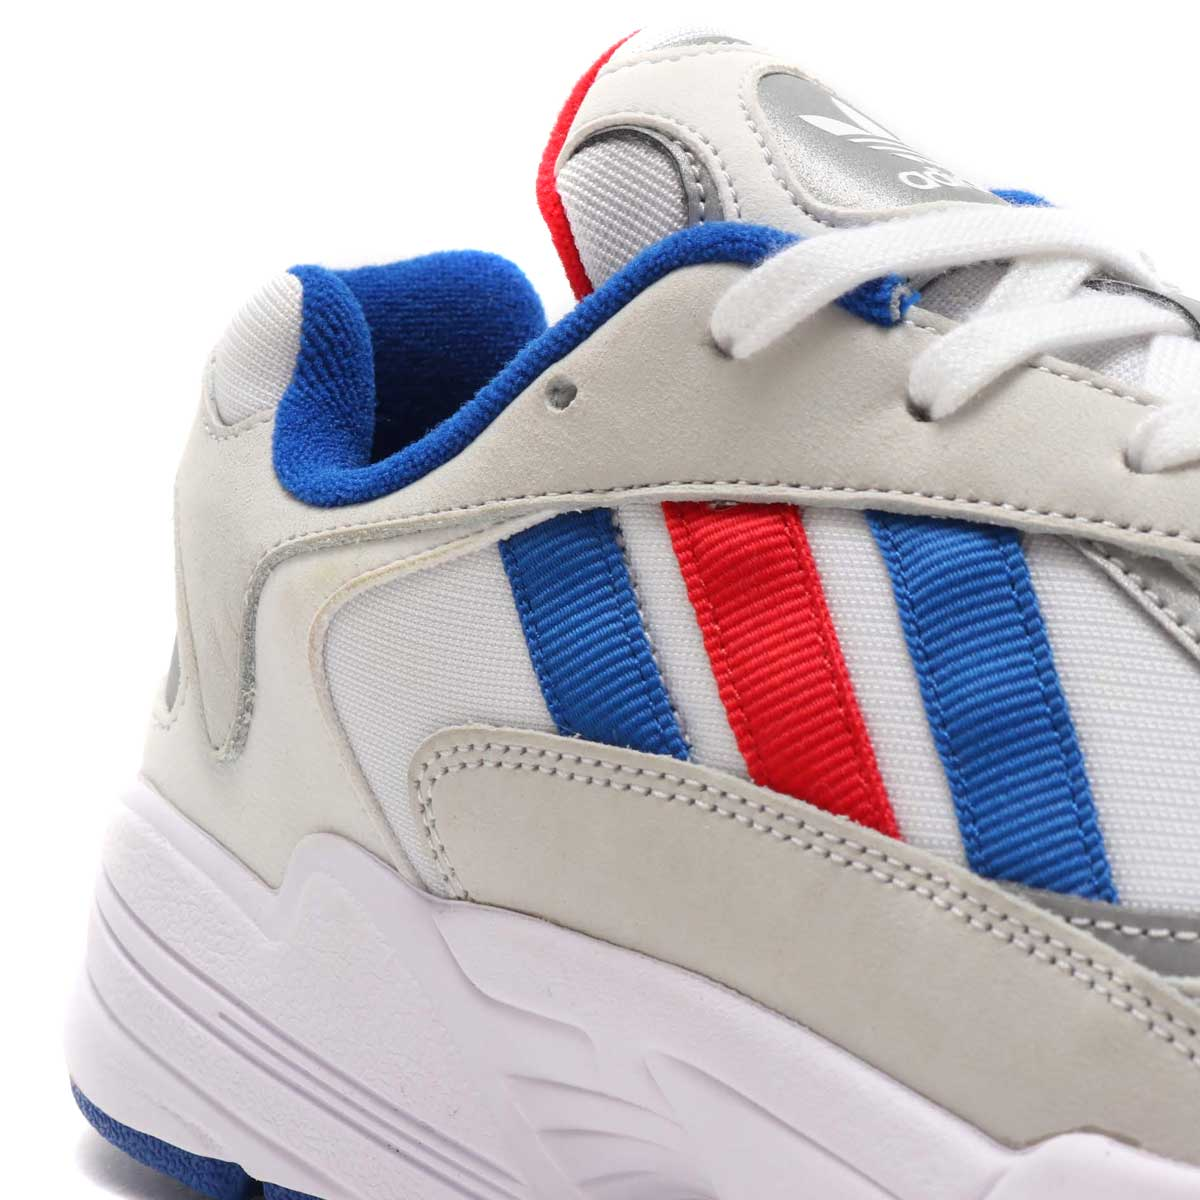 f:id:sneakerscaffetokyo:20190314180003j:plain